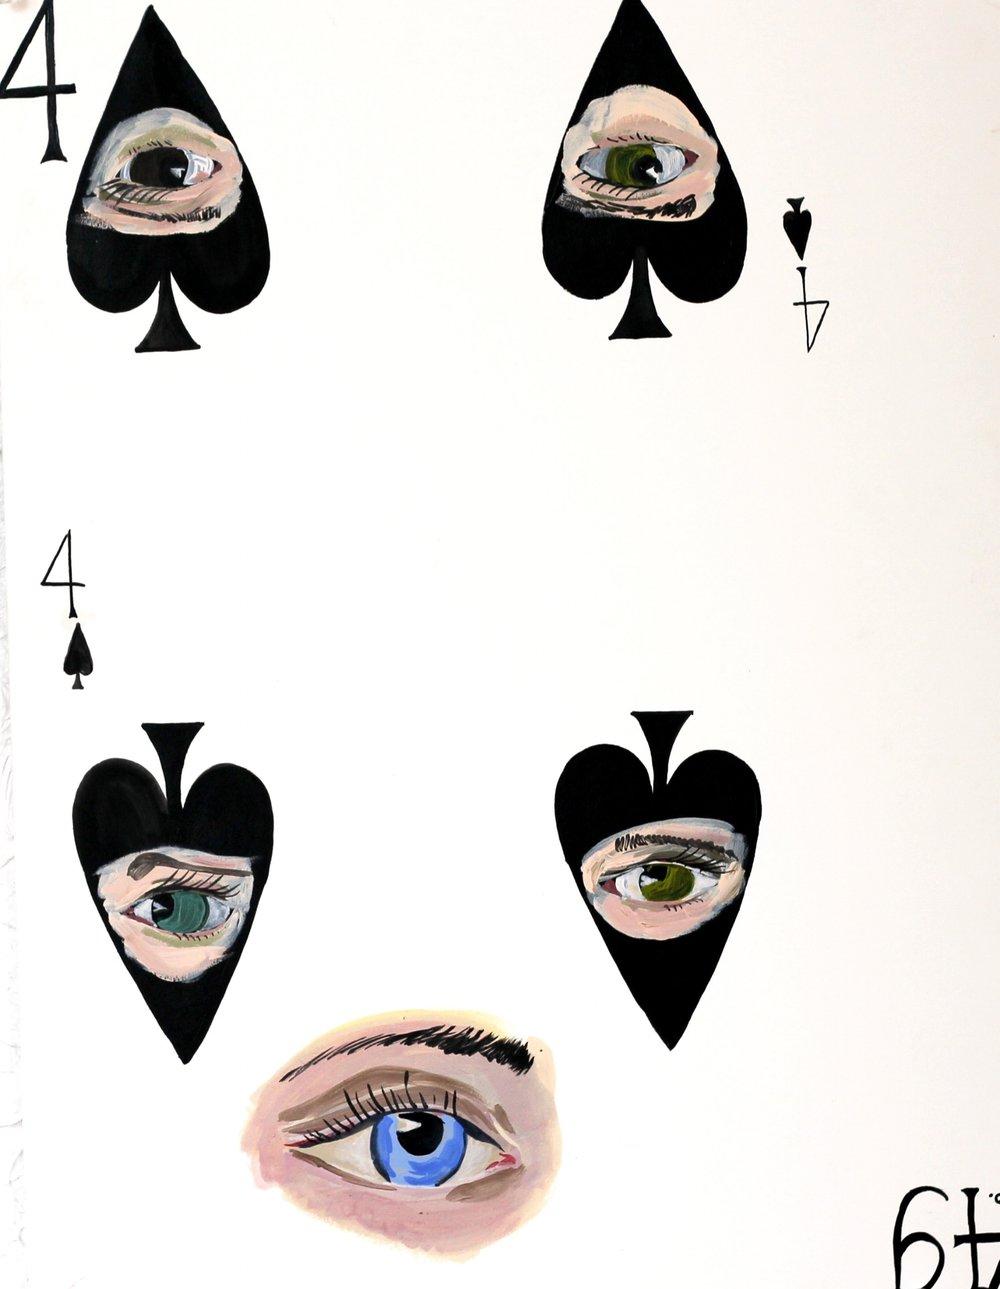 4 of Spades.jpg